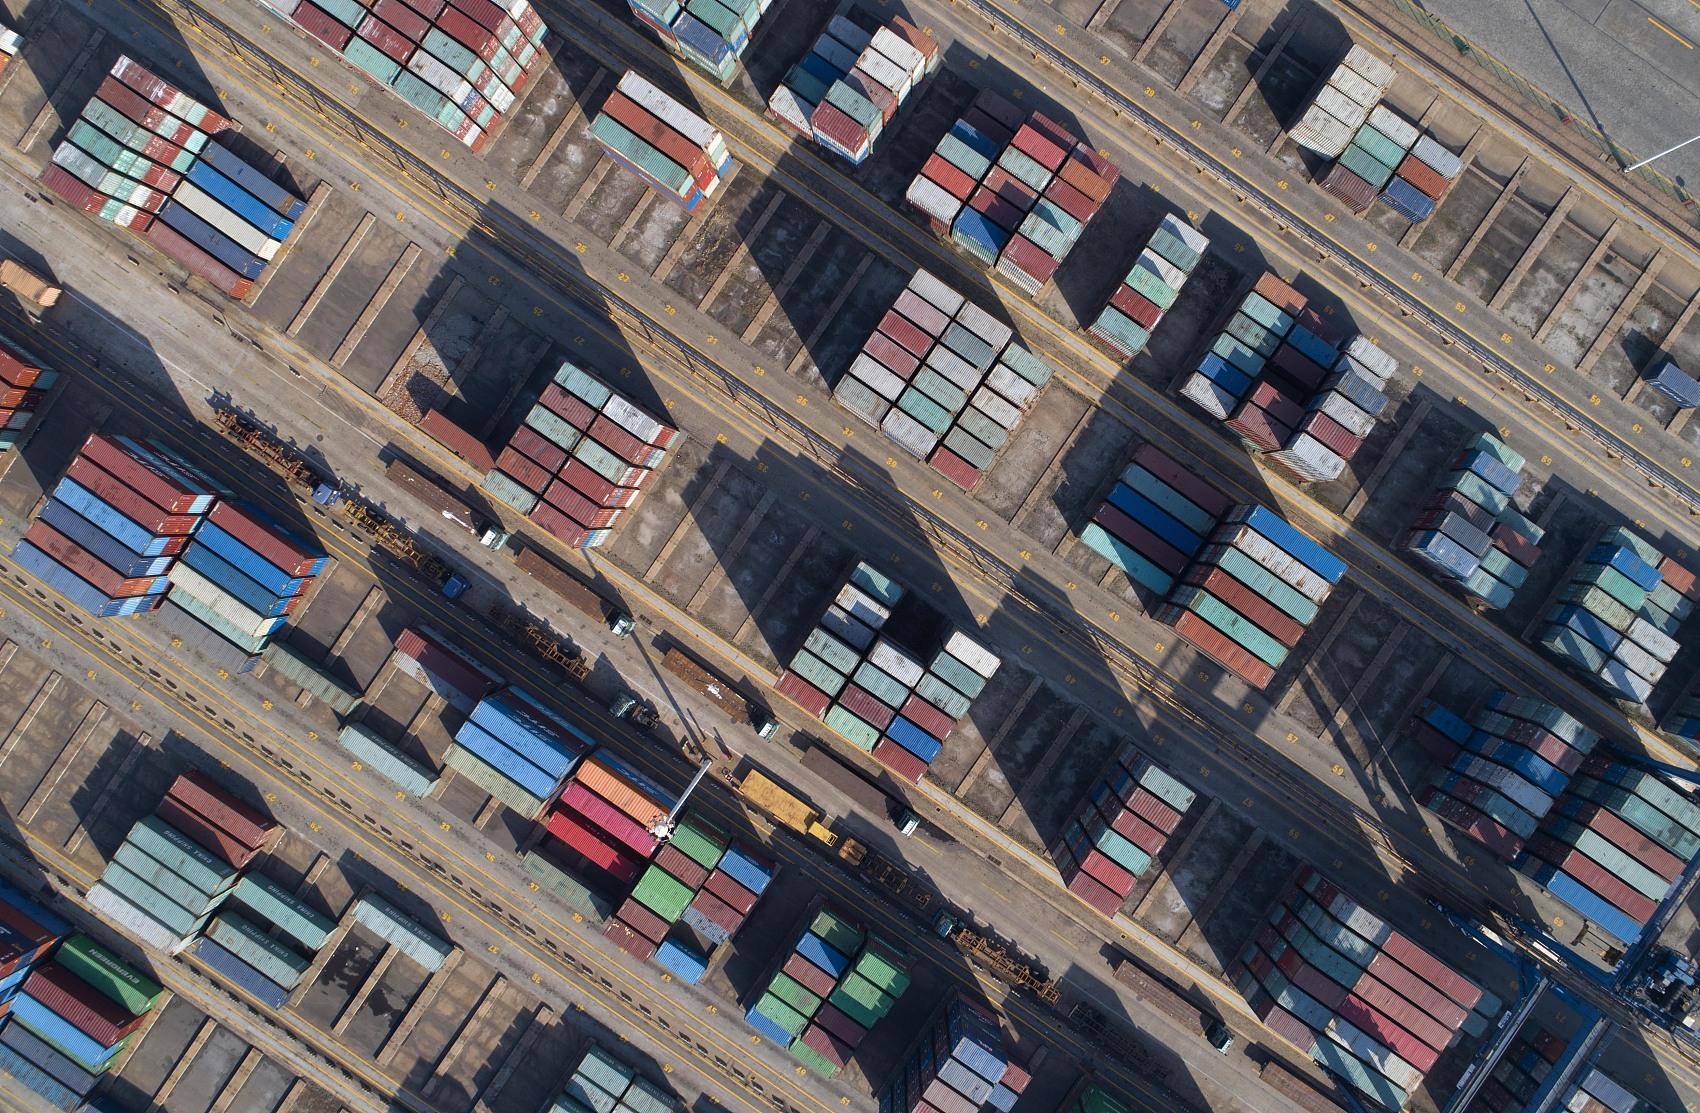 China's industrial profits fall in Jan-Feb as virus hurts activities